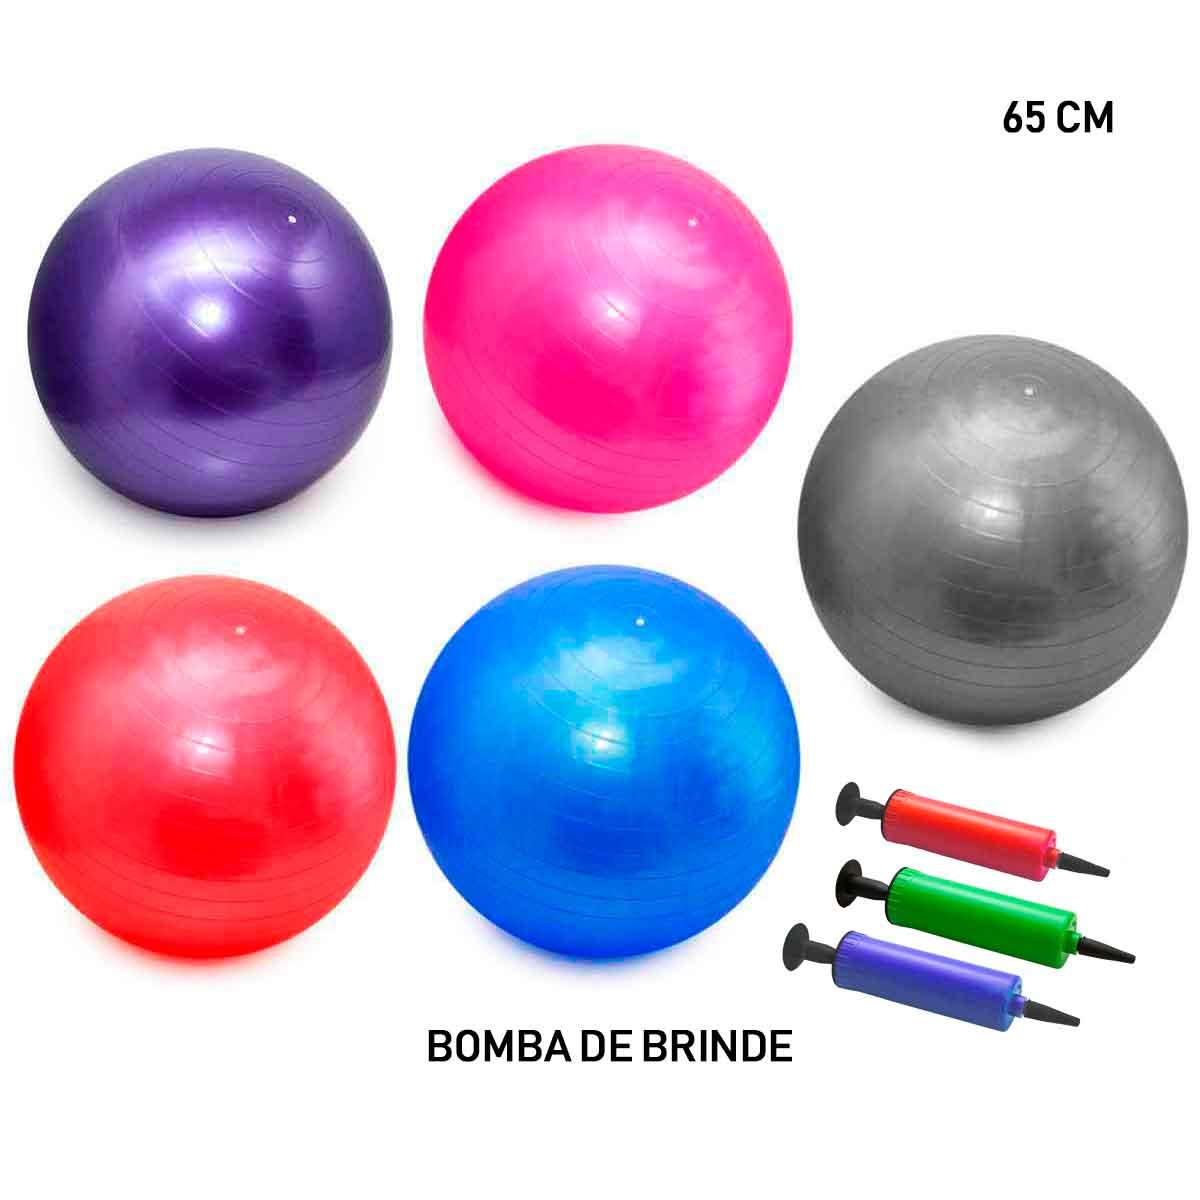 Bola Pilates Yoga Abdominal Ginástica Fitness 65cm C/ Bomba